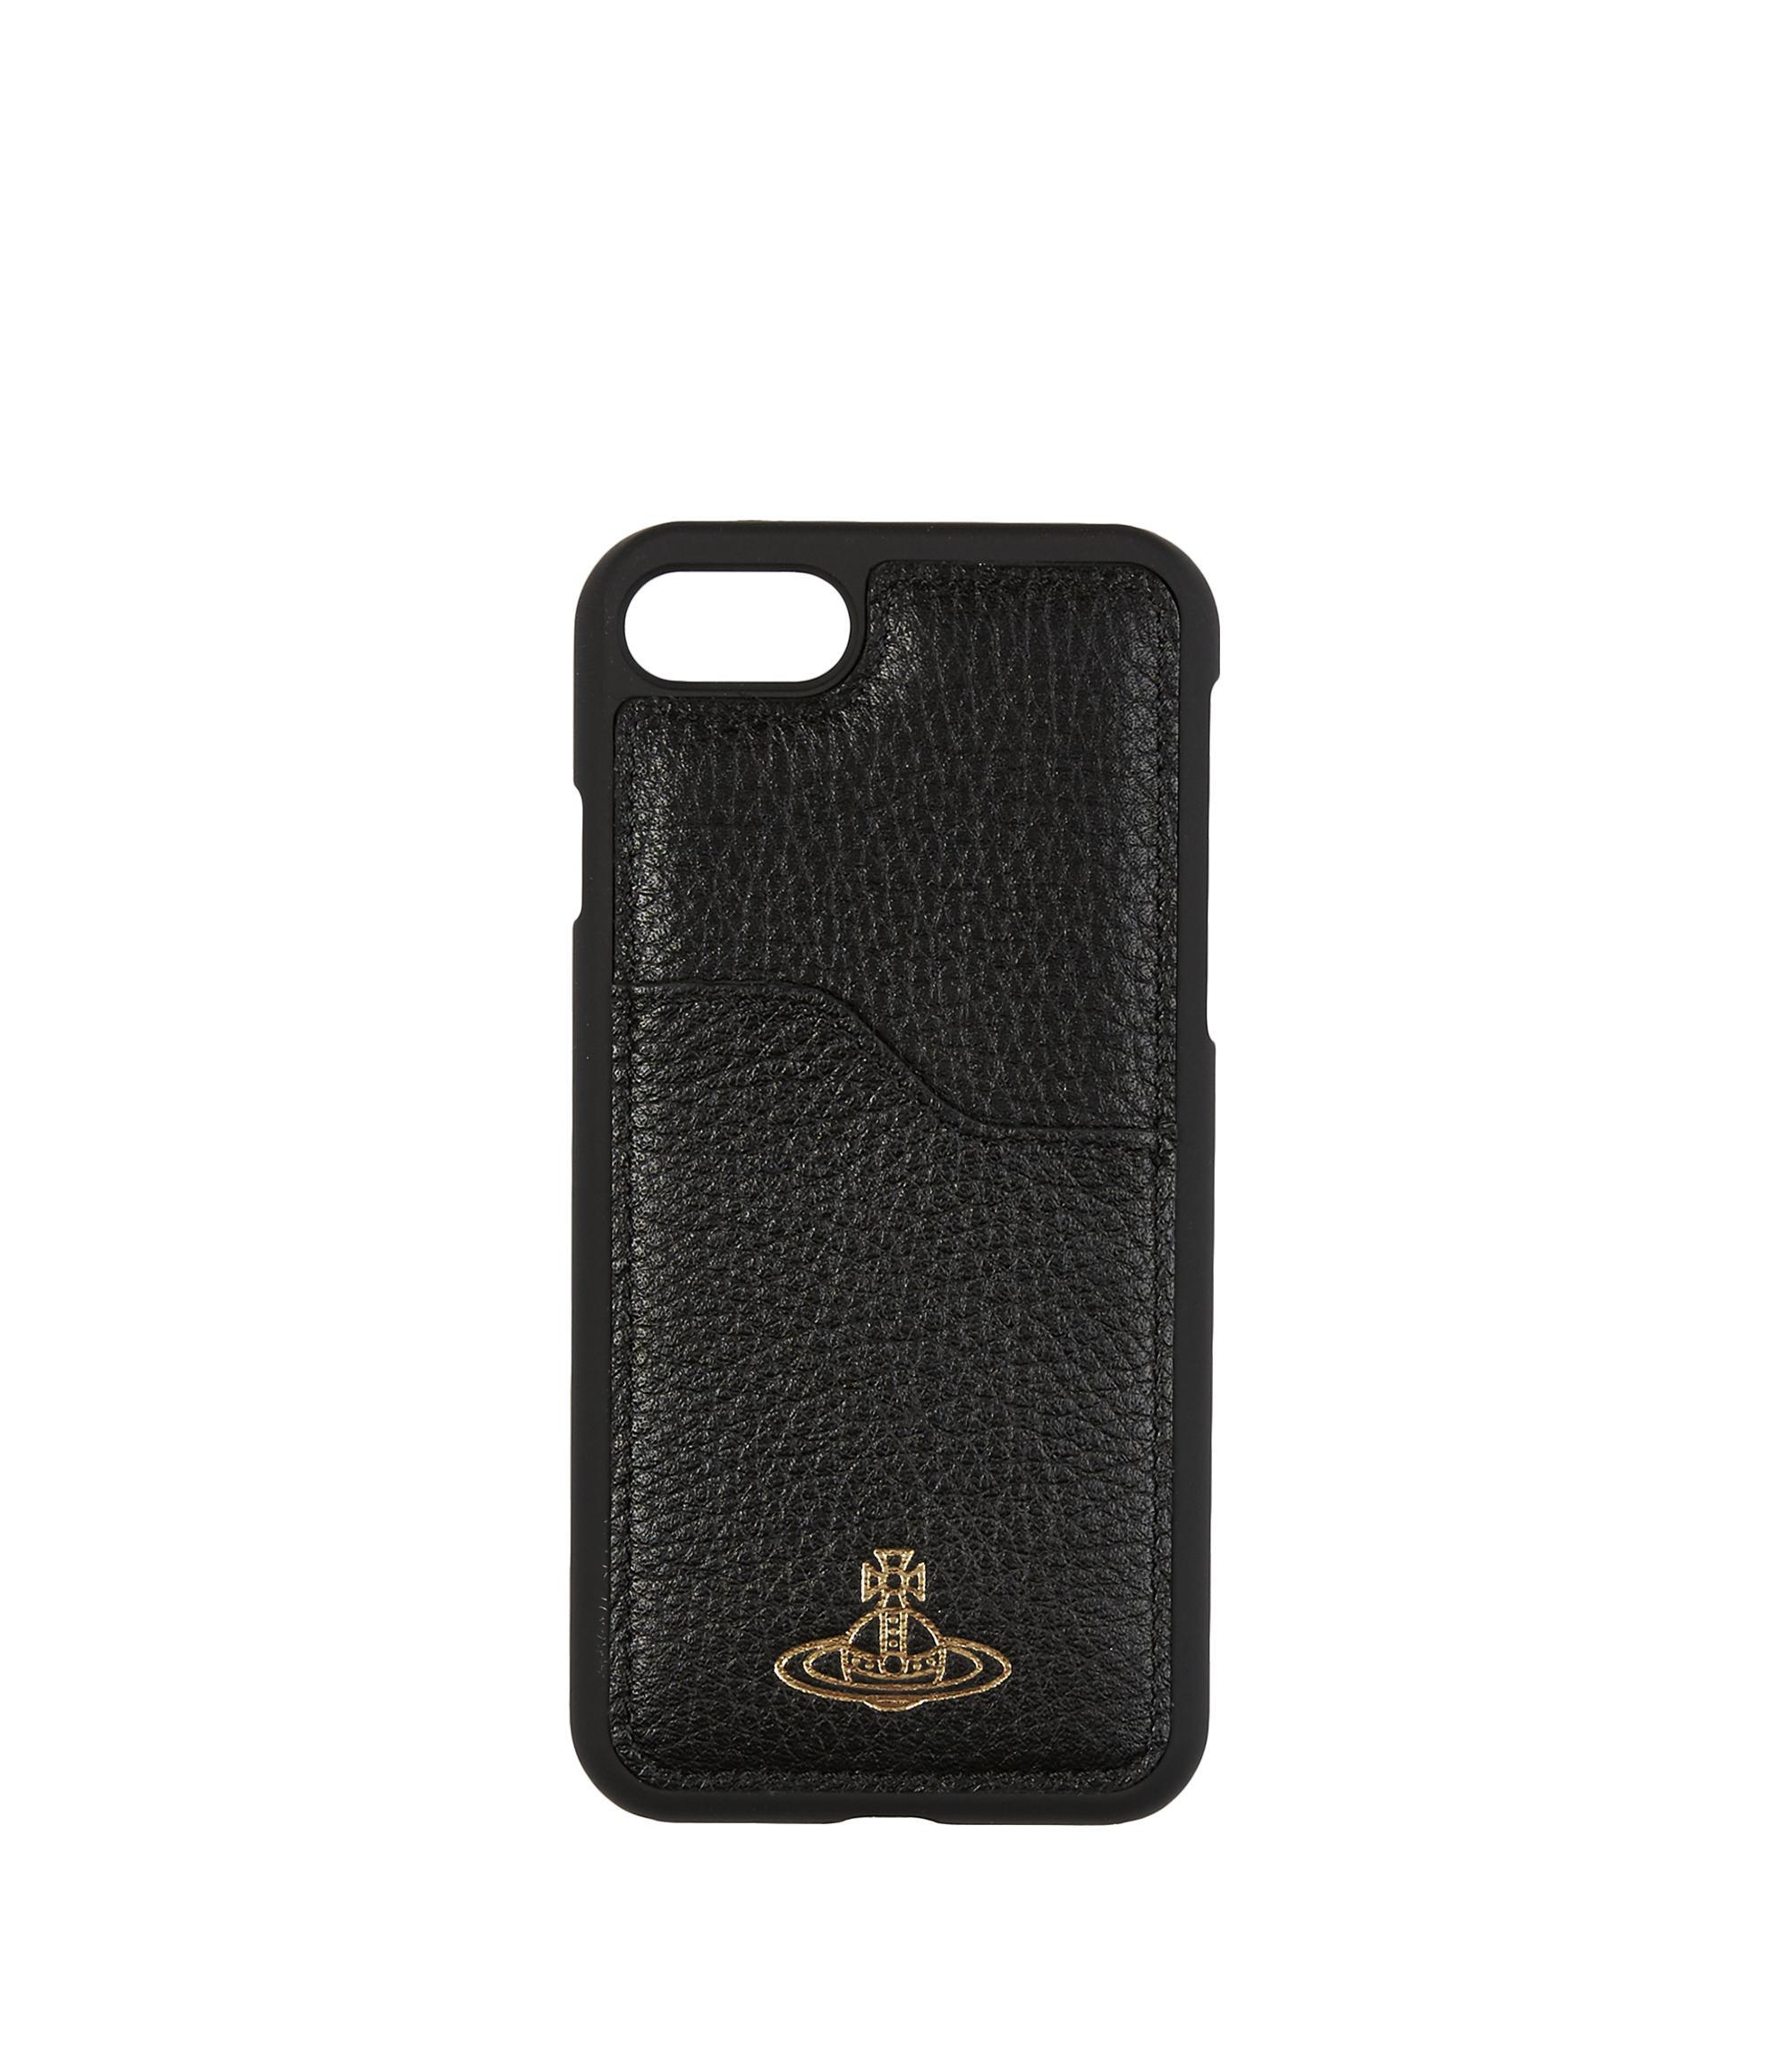 brand new 1b4e3 c62ba Vivienne Westwood Iphone 7/8 Case Black